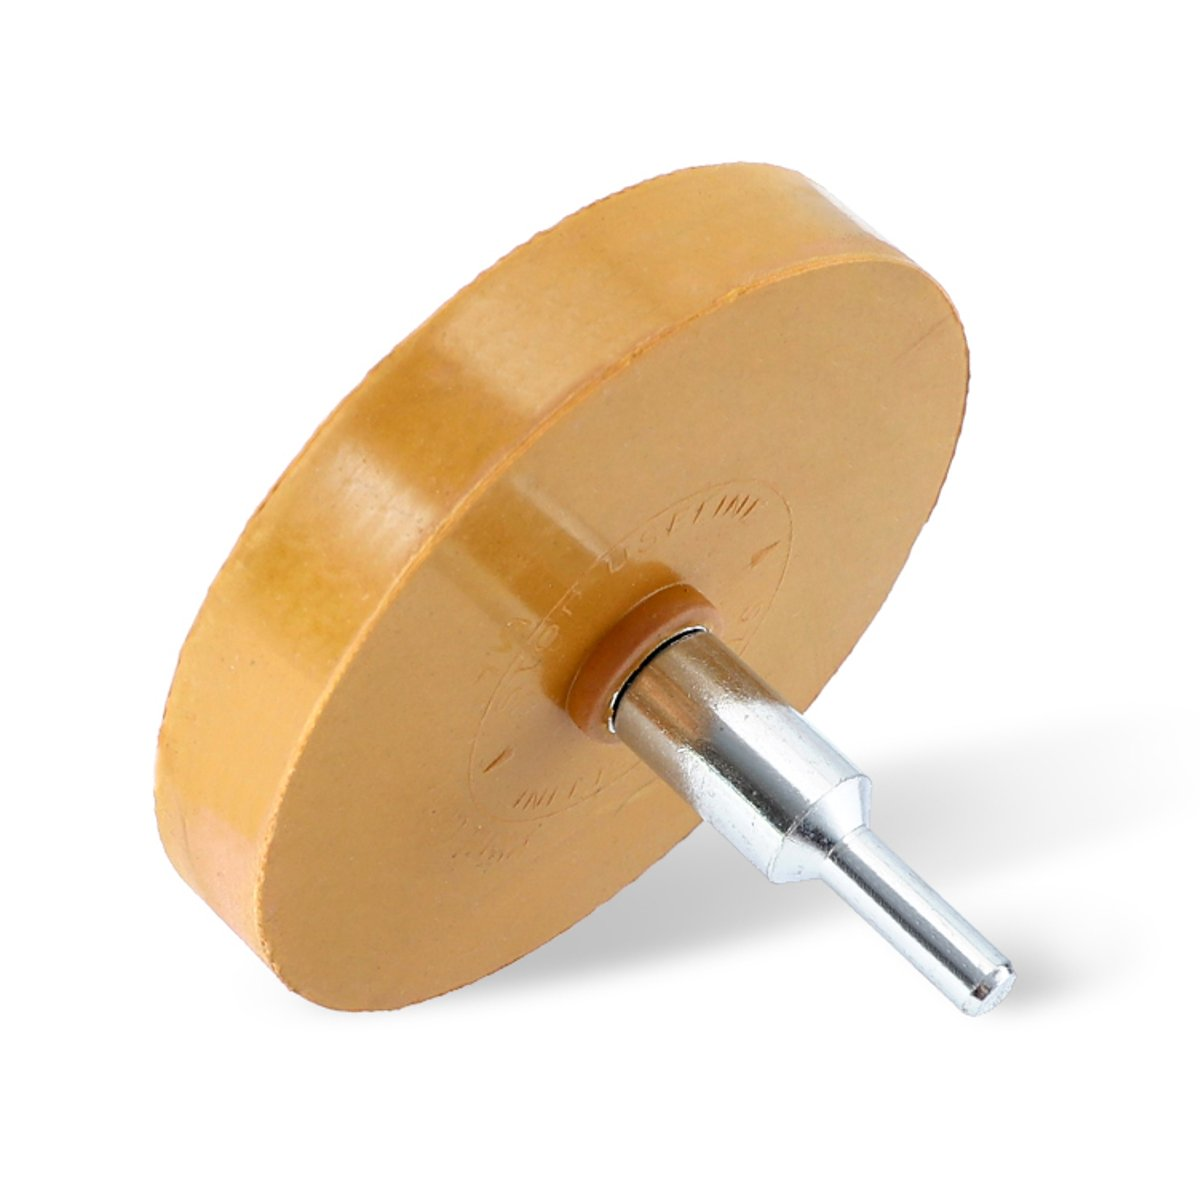 88*15mm Rubber Eraser Wheel Arbor Pinstripe Sticker Decal Tape Glue Adhesive Remover